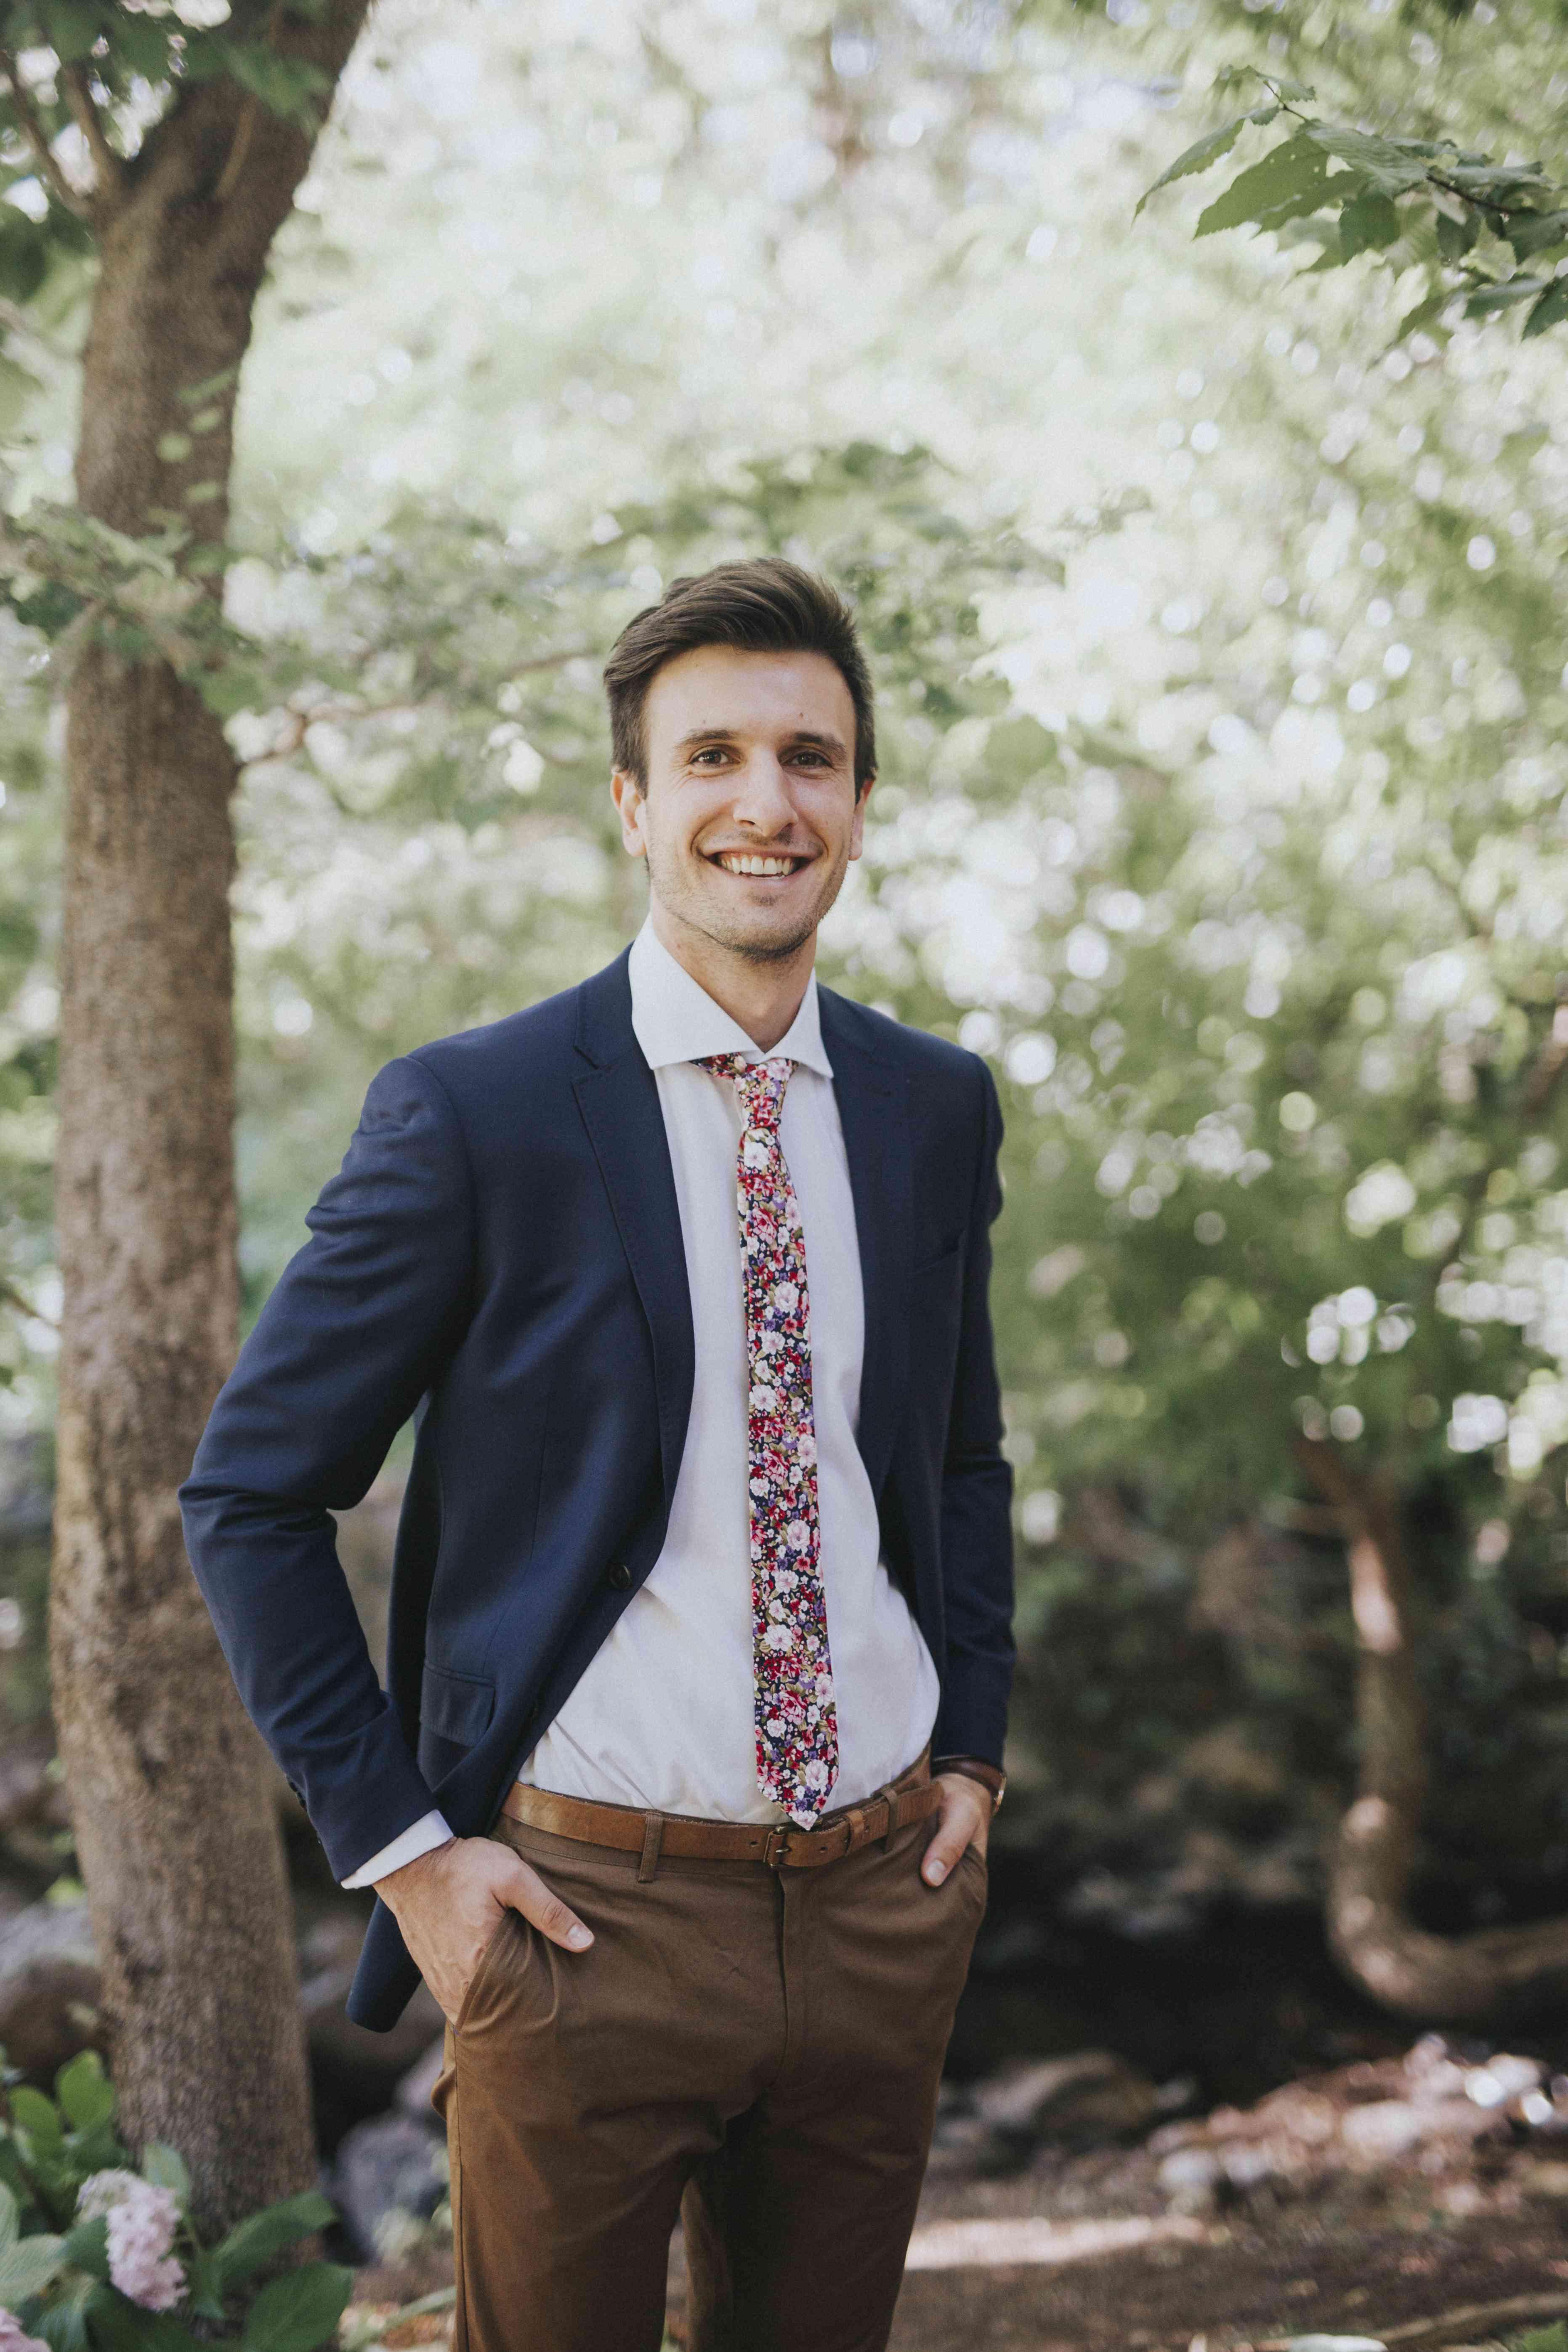 Groom in a floral tie